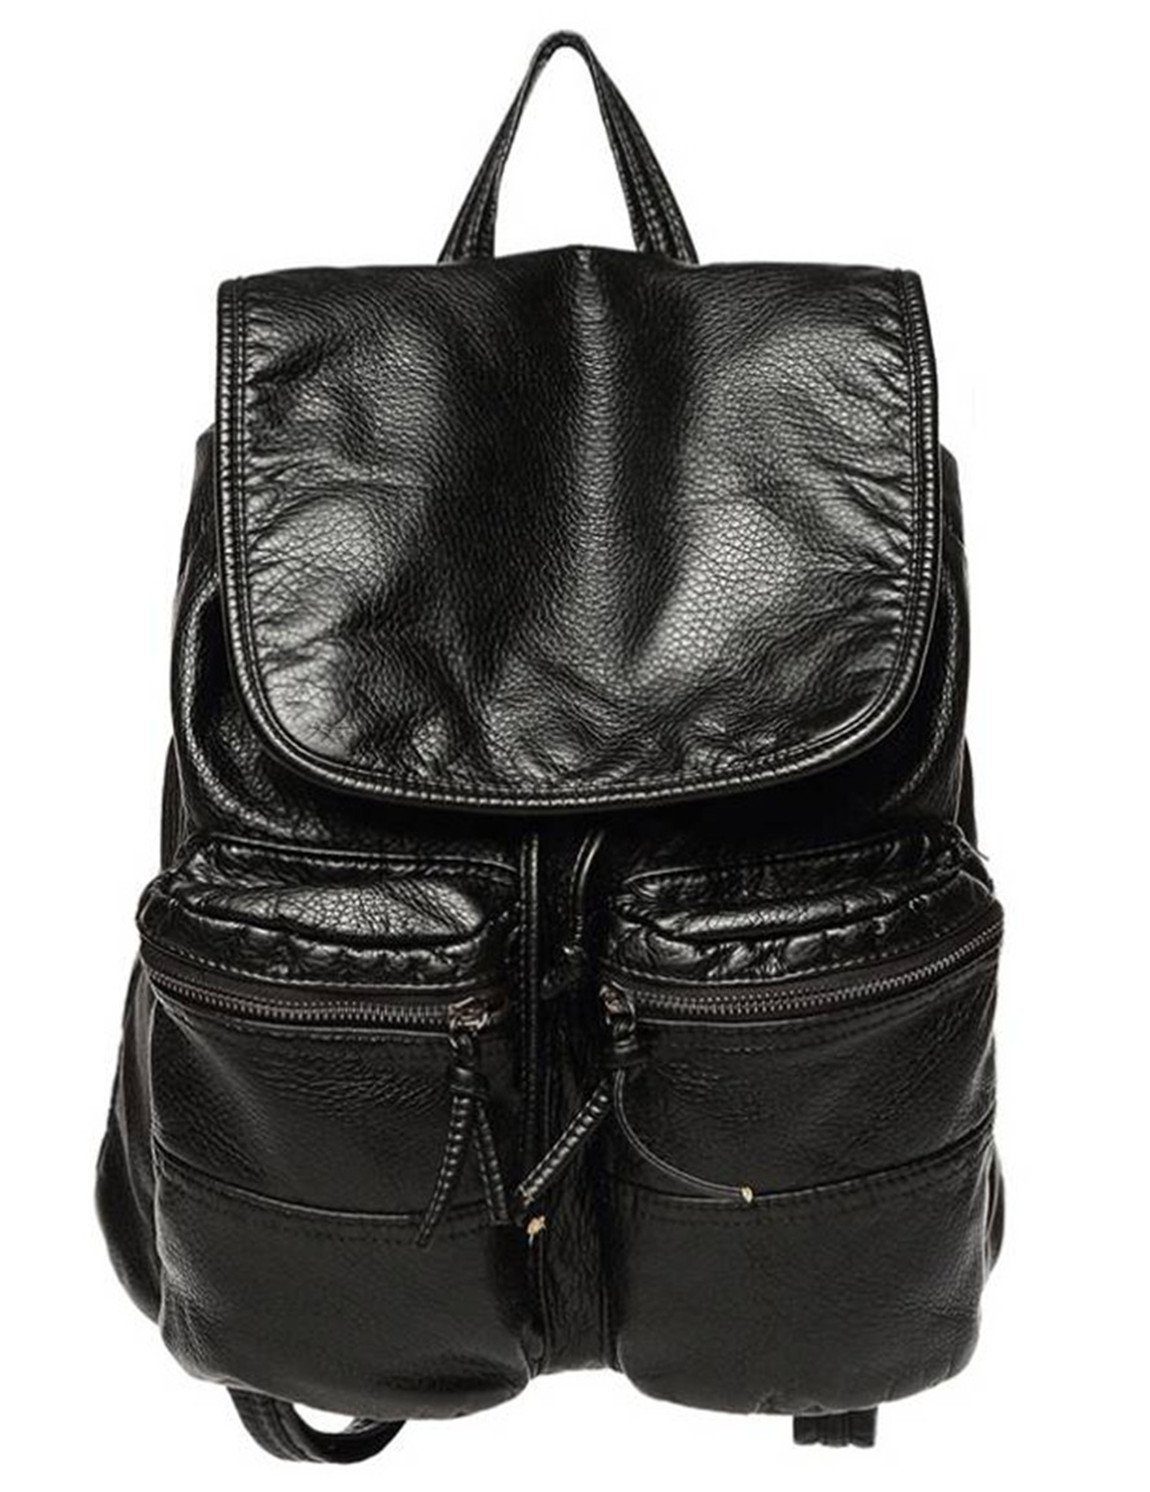 Leather Shoulder Handbag for Women, New Fashion Leisure Folding Bag Soft Black Backpack by WoWen